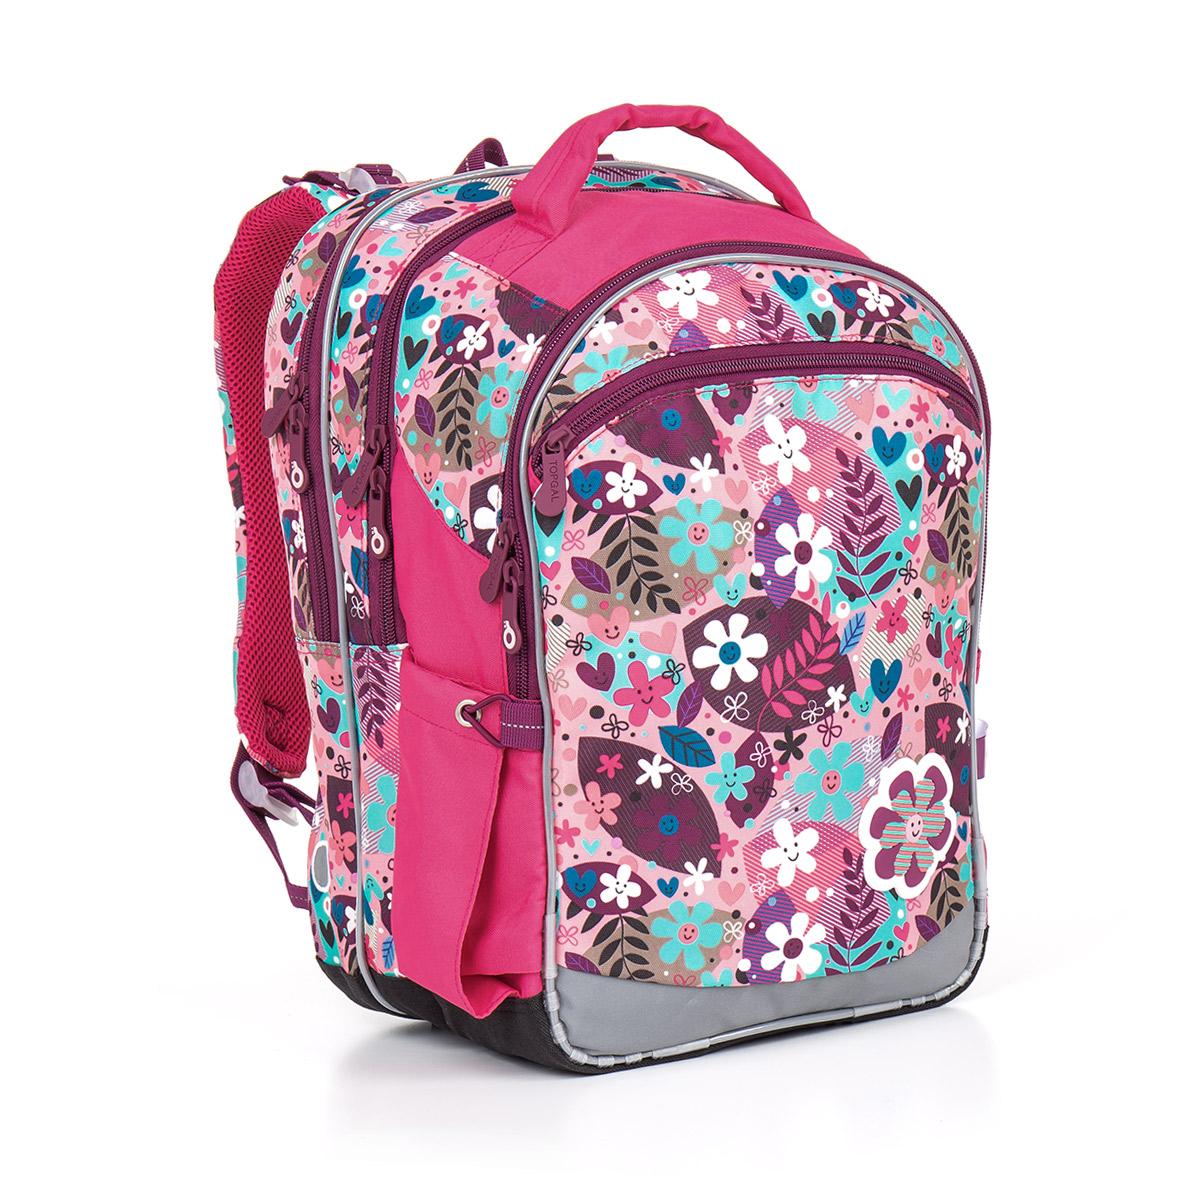 Topgal školní bath CHI 845 H Pink